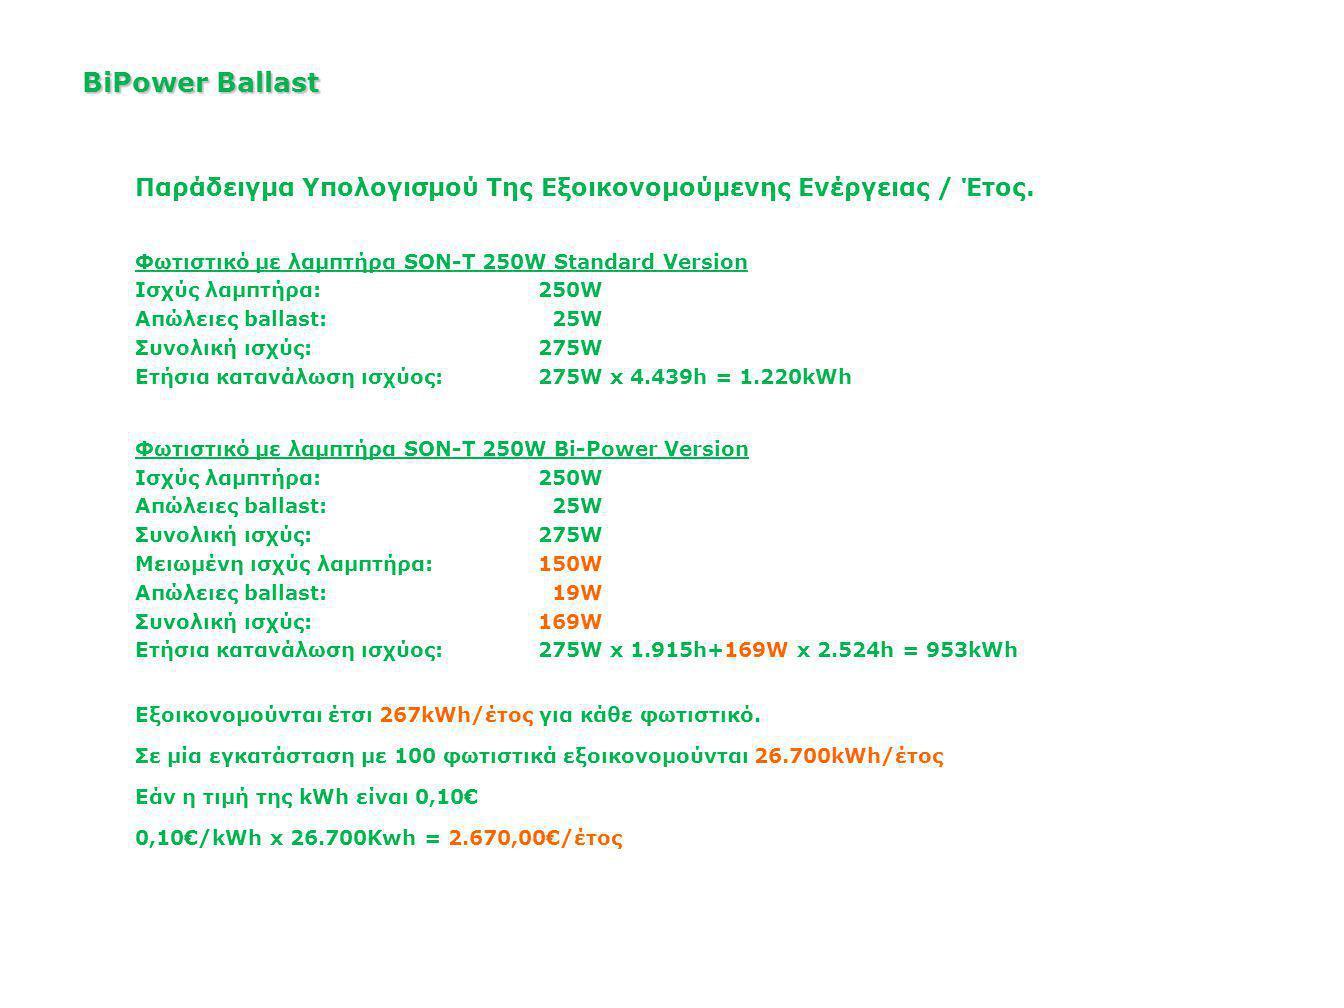 BiPower Ballast Παράδειγμα Υπολογισμού Της Εξοικονομούμενης Ενέργειας / Έτος. Φωτιστικό με λαμπτήρα SON-T 250W Standard Version.